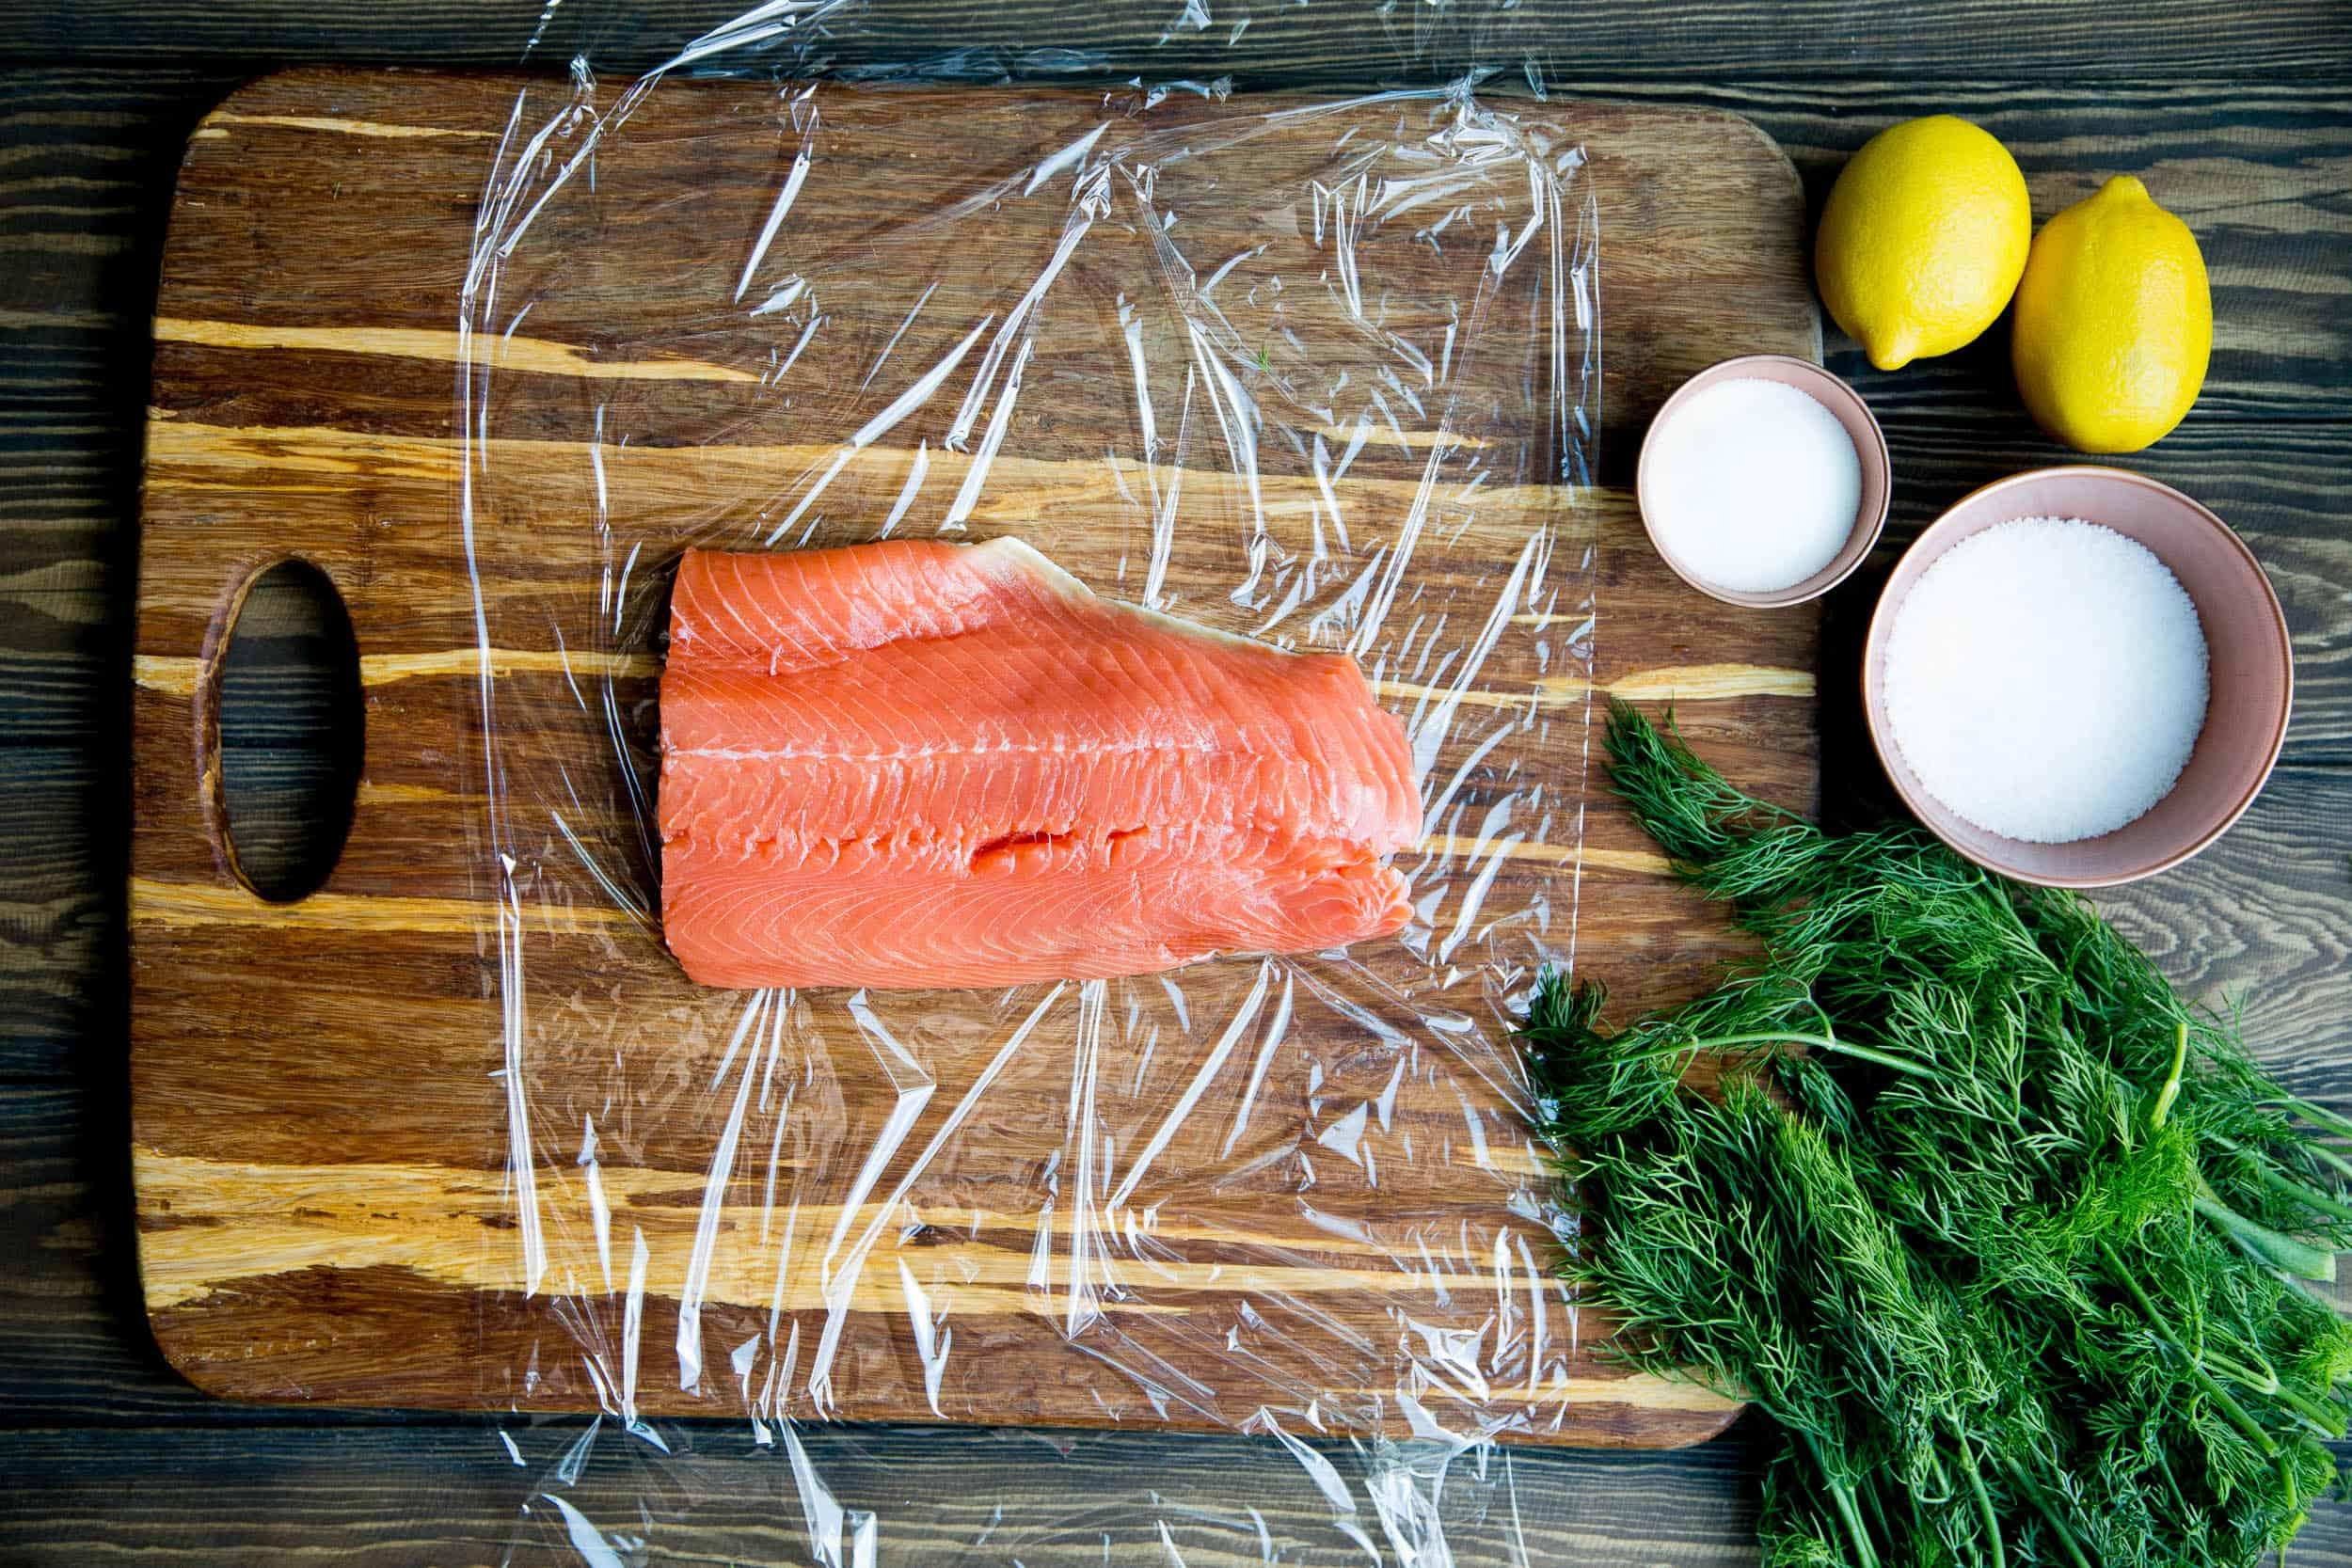 How to make Homemade Cured Salmon (Gravlax) | perrysplate.com